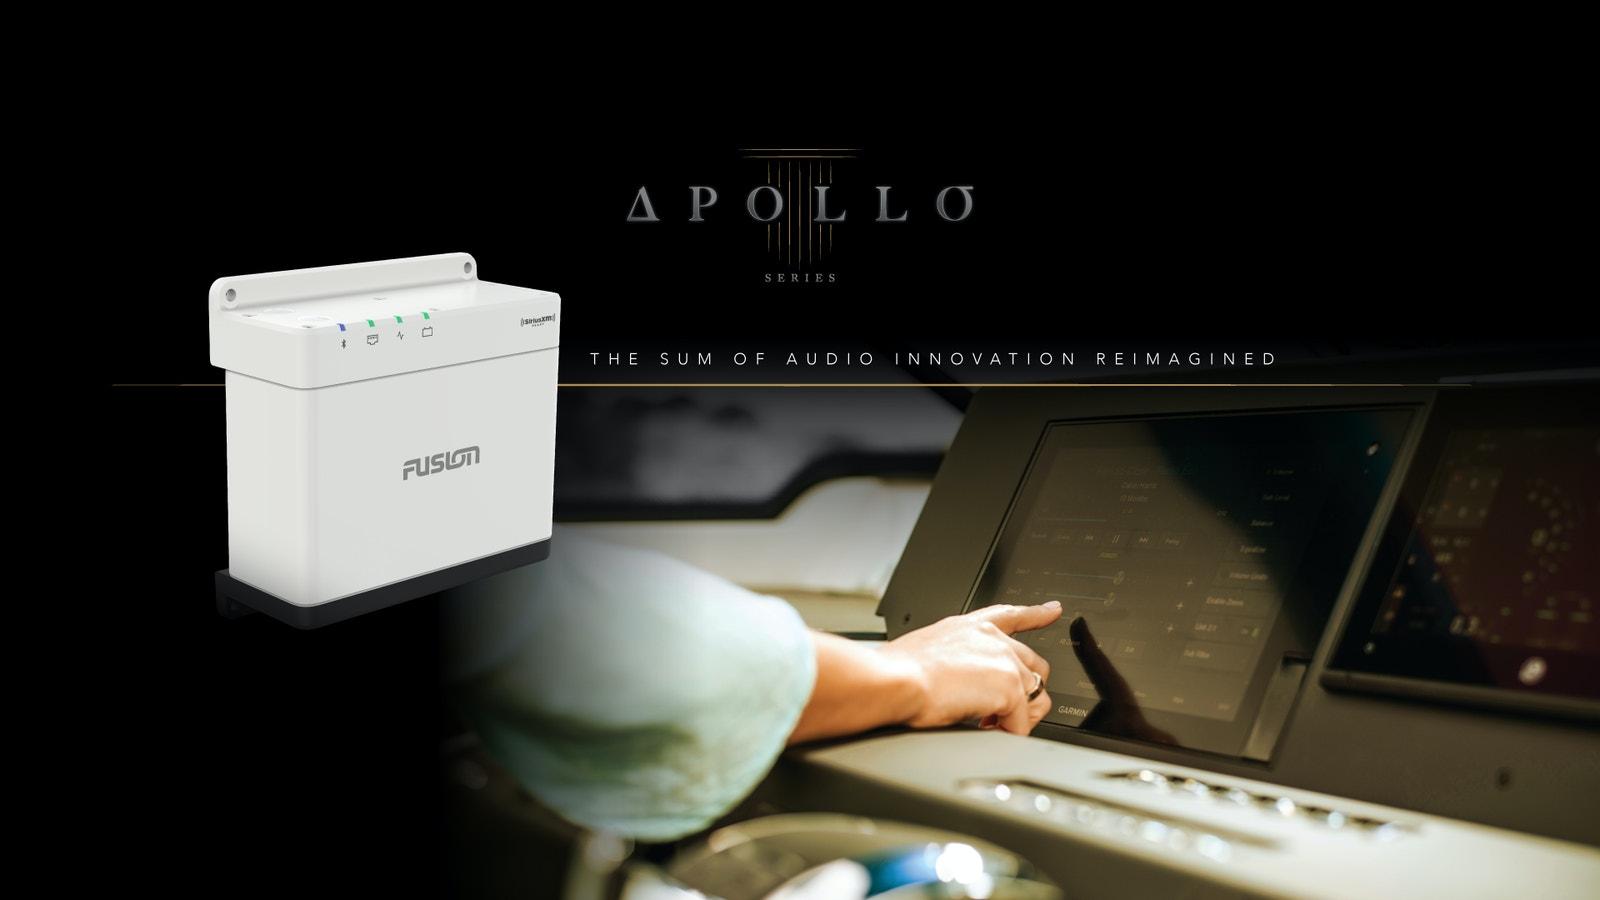 Fusion Apollo MS-RA670